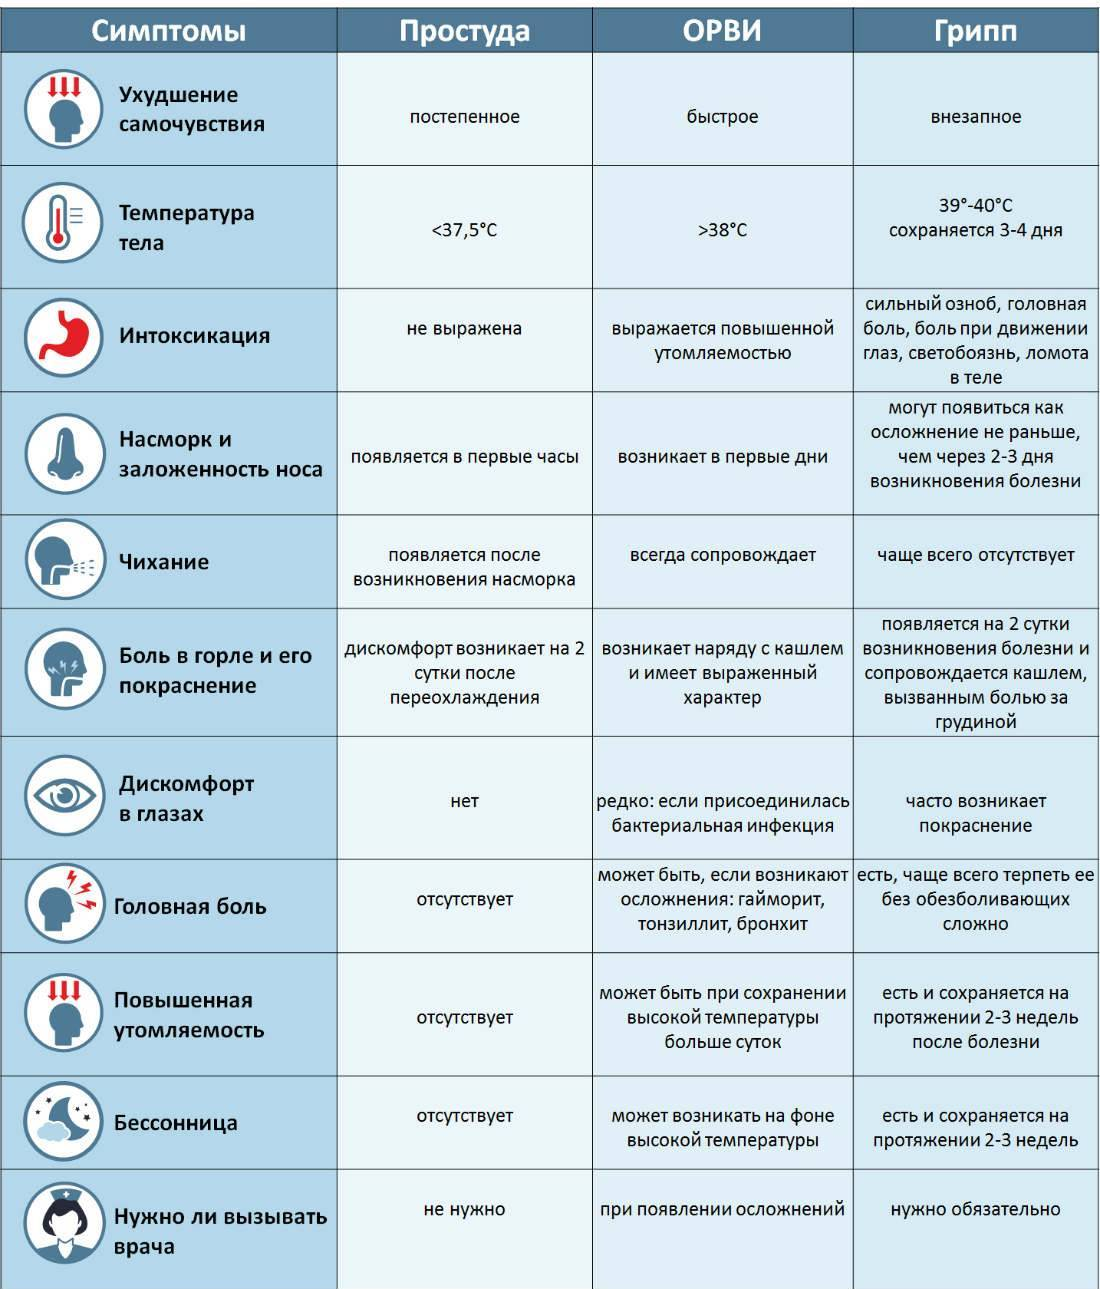 Грипп лошадей (equine influenza)